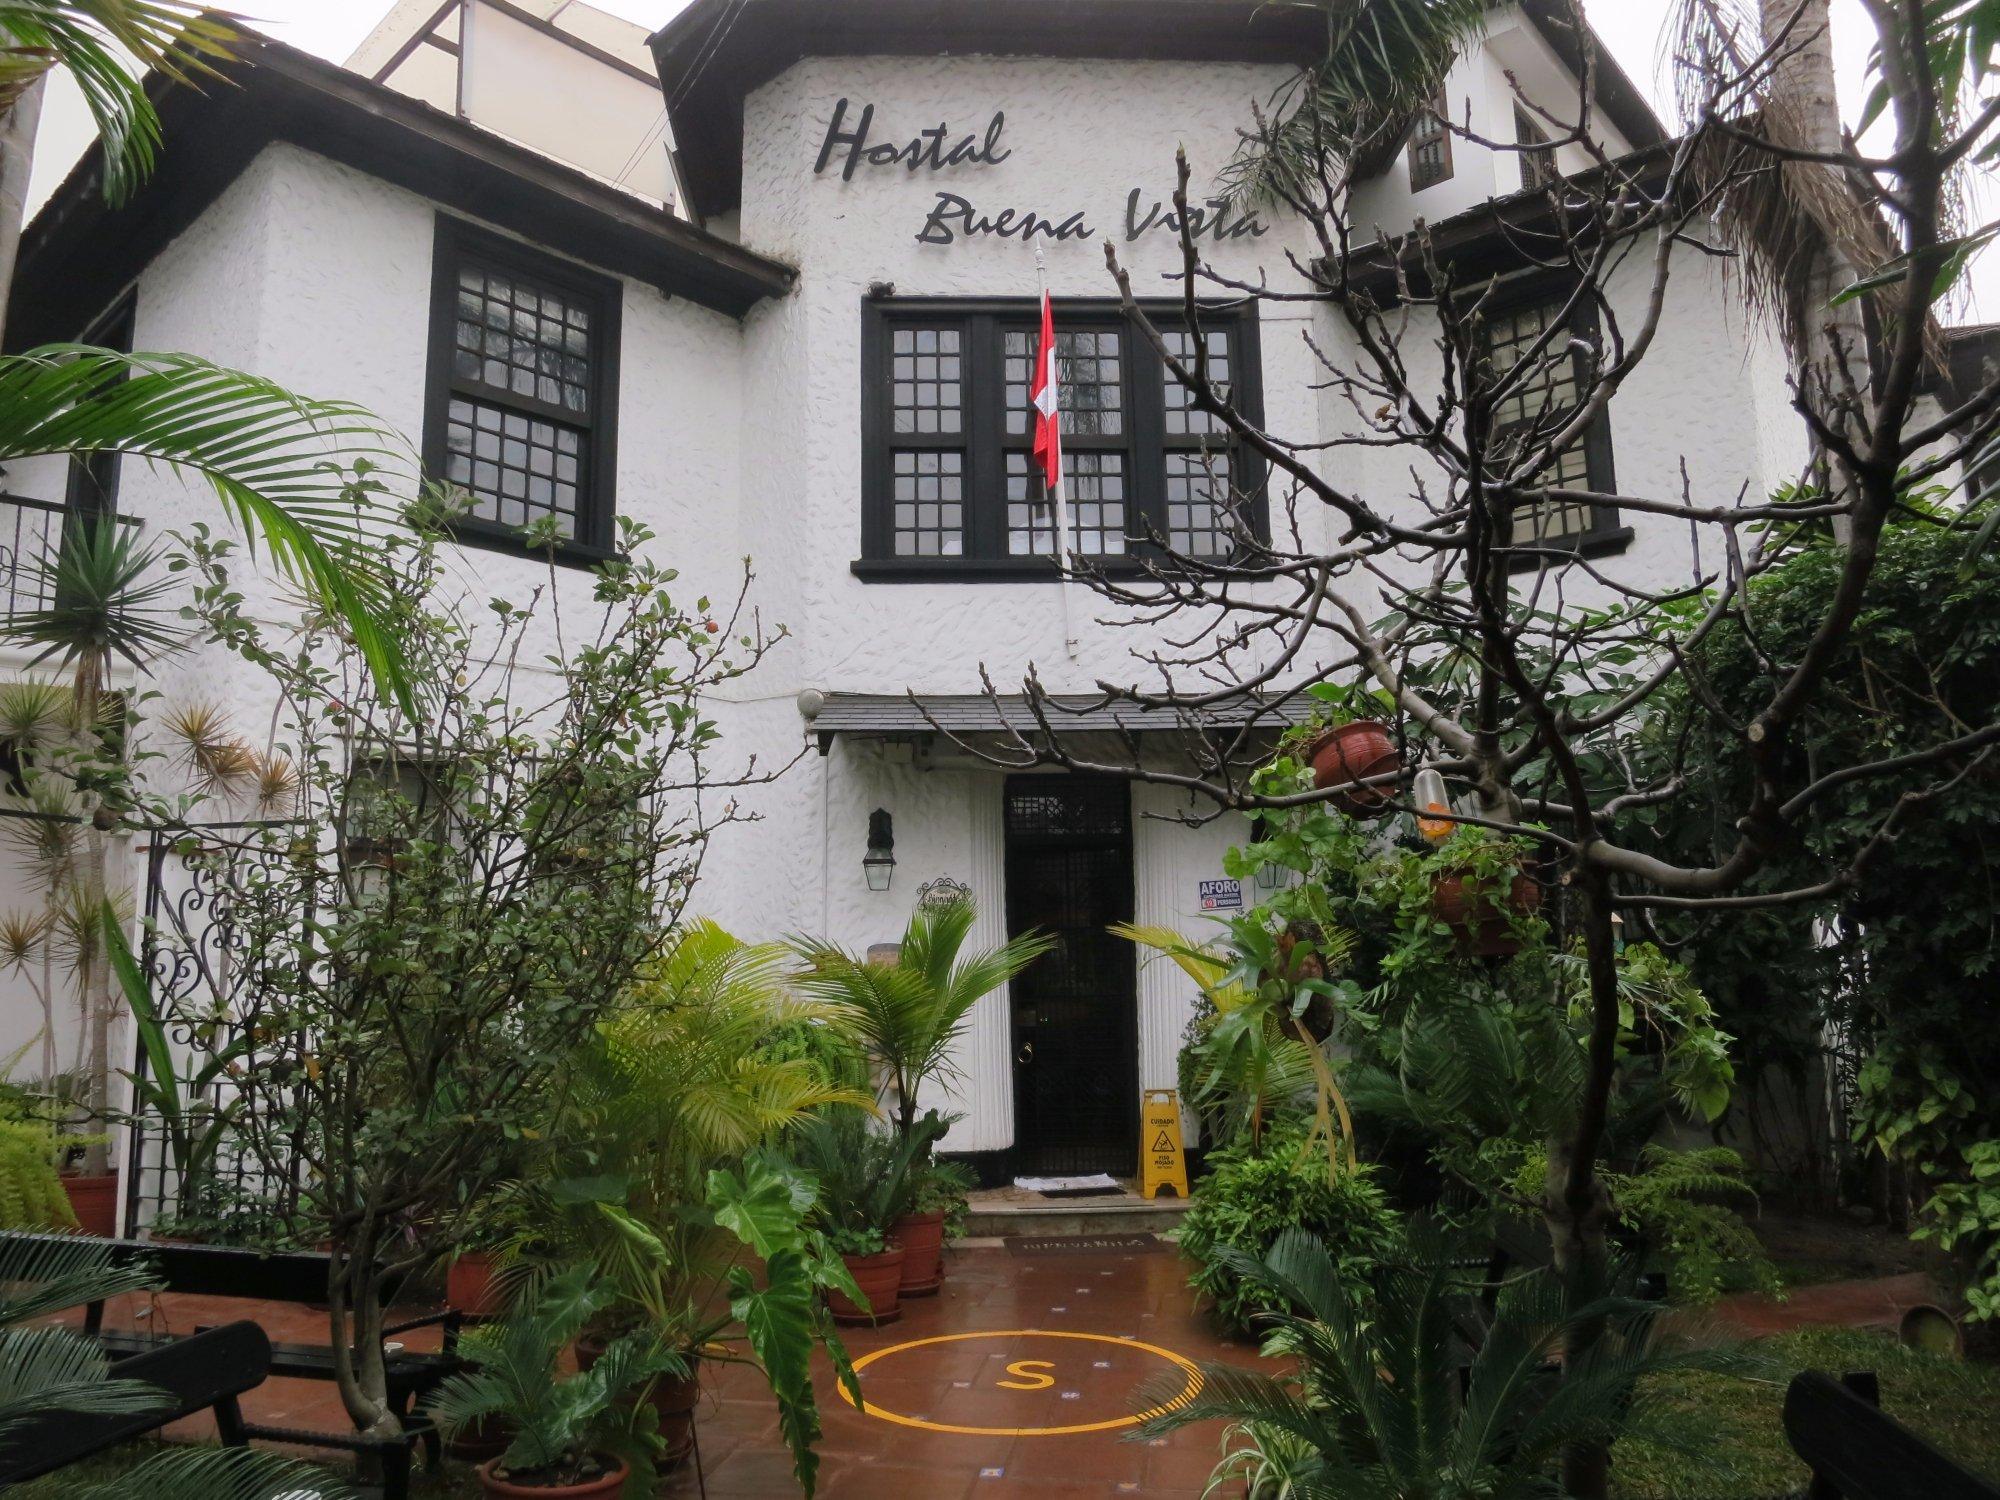 Hostal Buena Vista